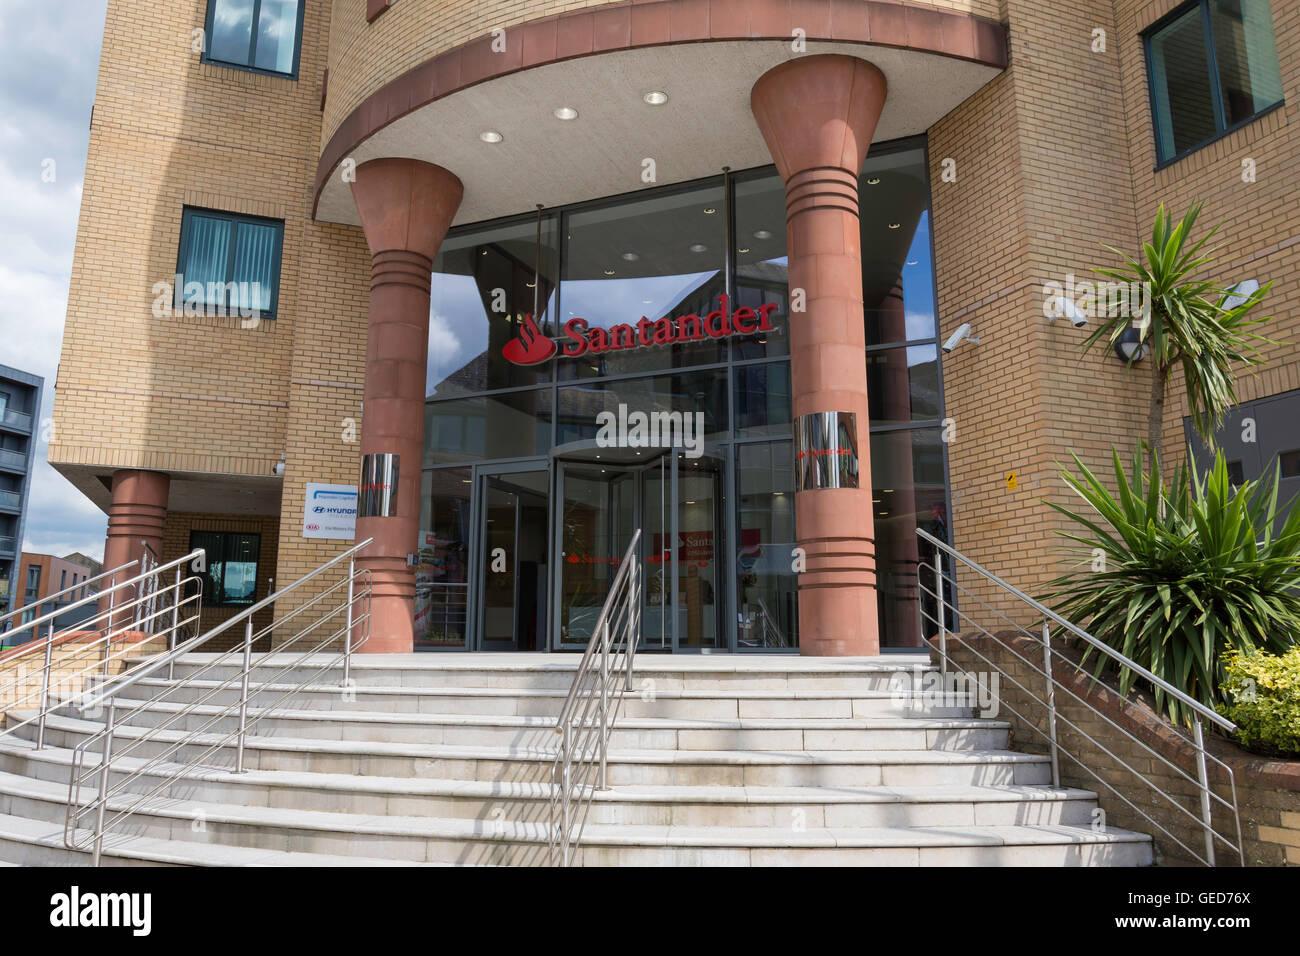 Entrance to Santander Consumer Finance building, Station Road, Redhill, Surrey, England, United Kingdom - Stock Image